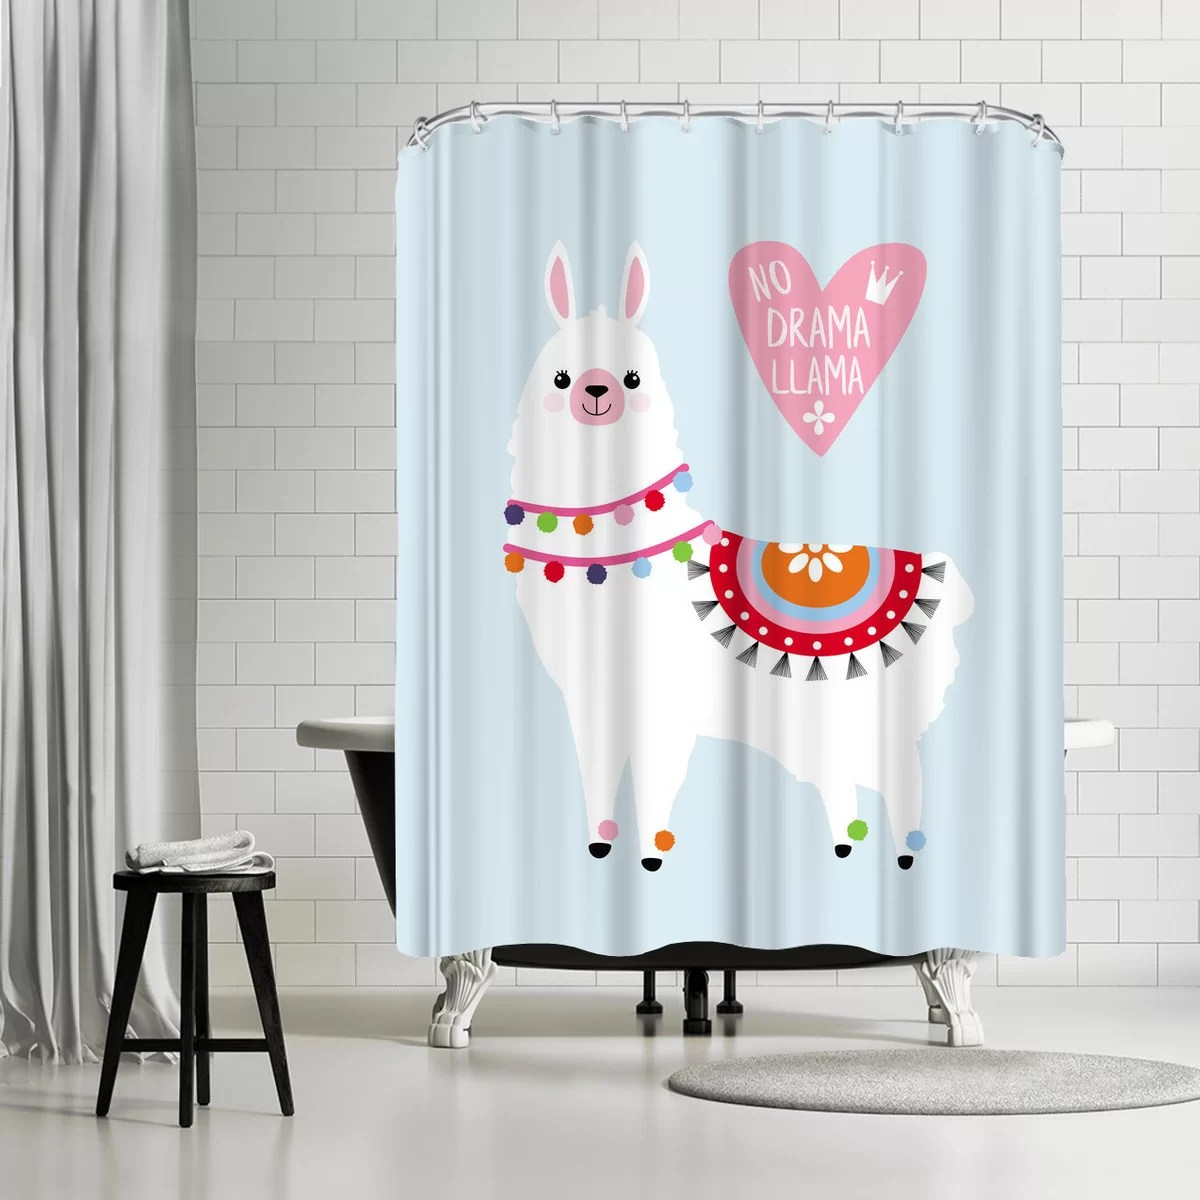 https www wayfair com bed bath pdp east urban home ikonolexi no drama llama shower curtain ebib8104 html